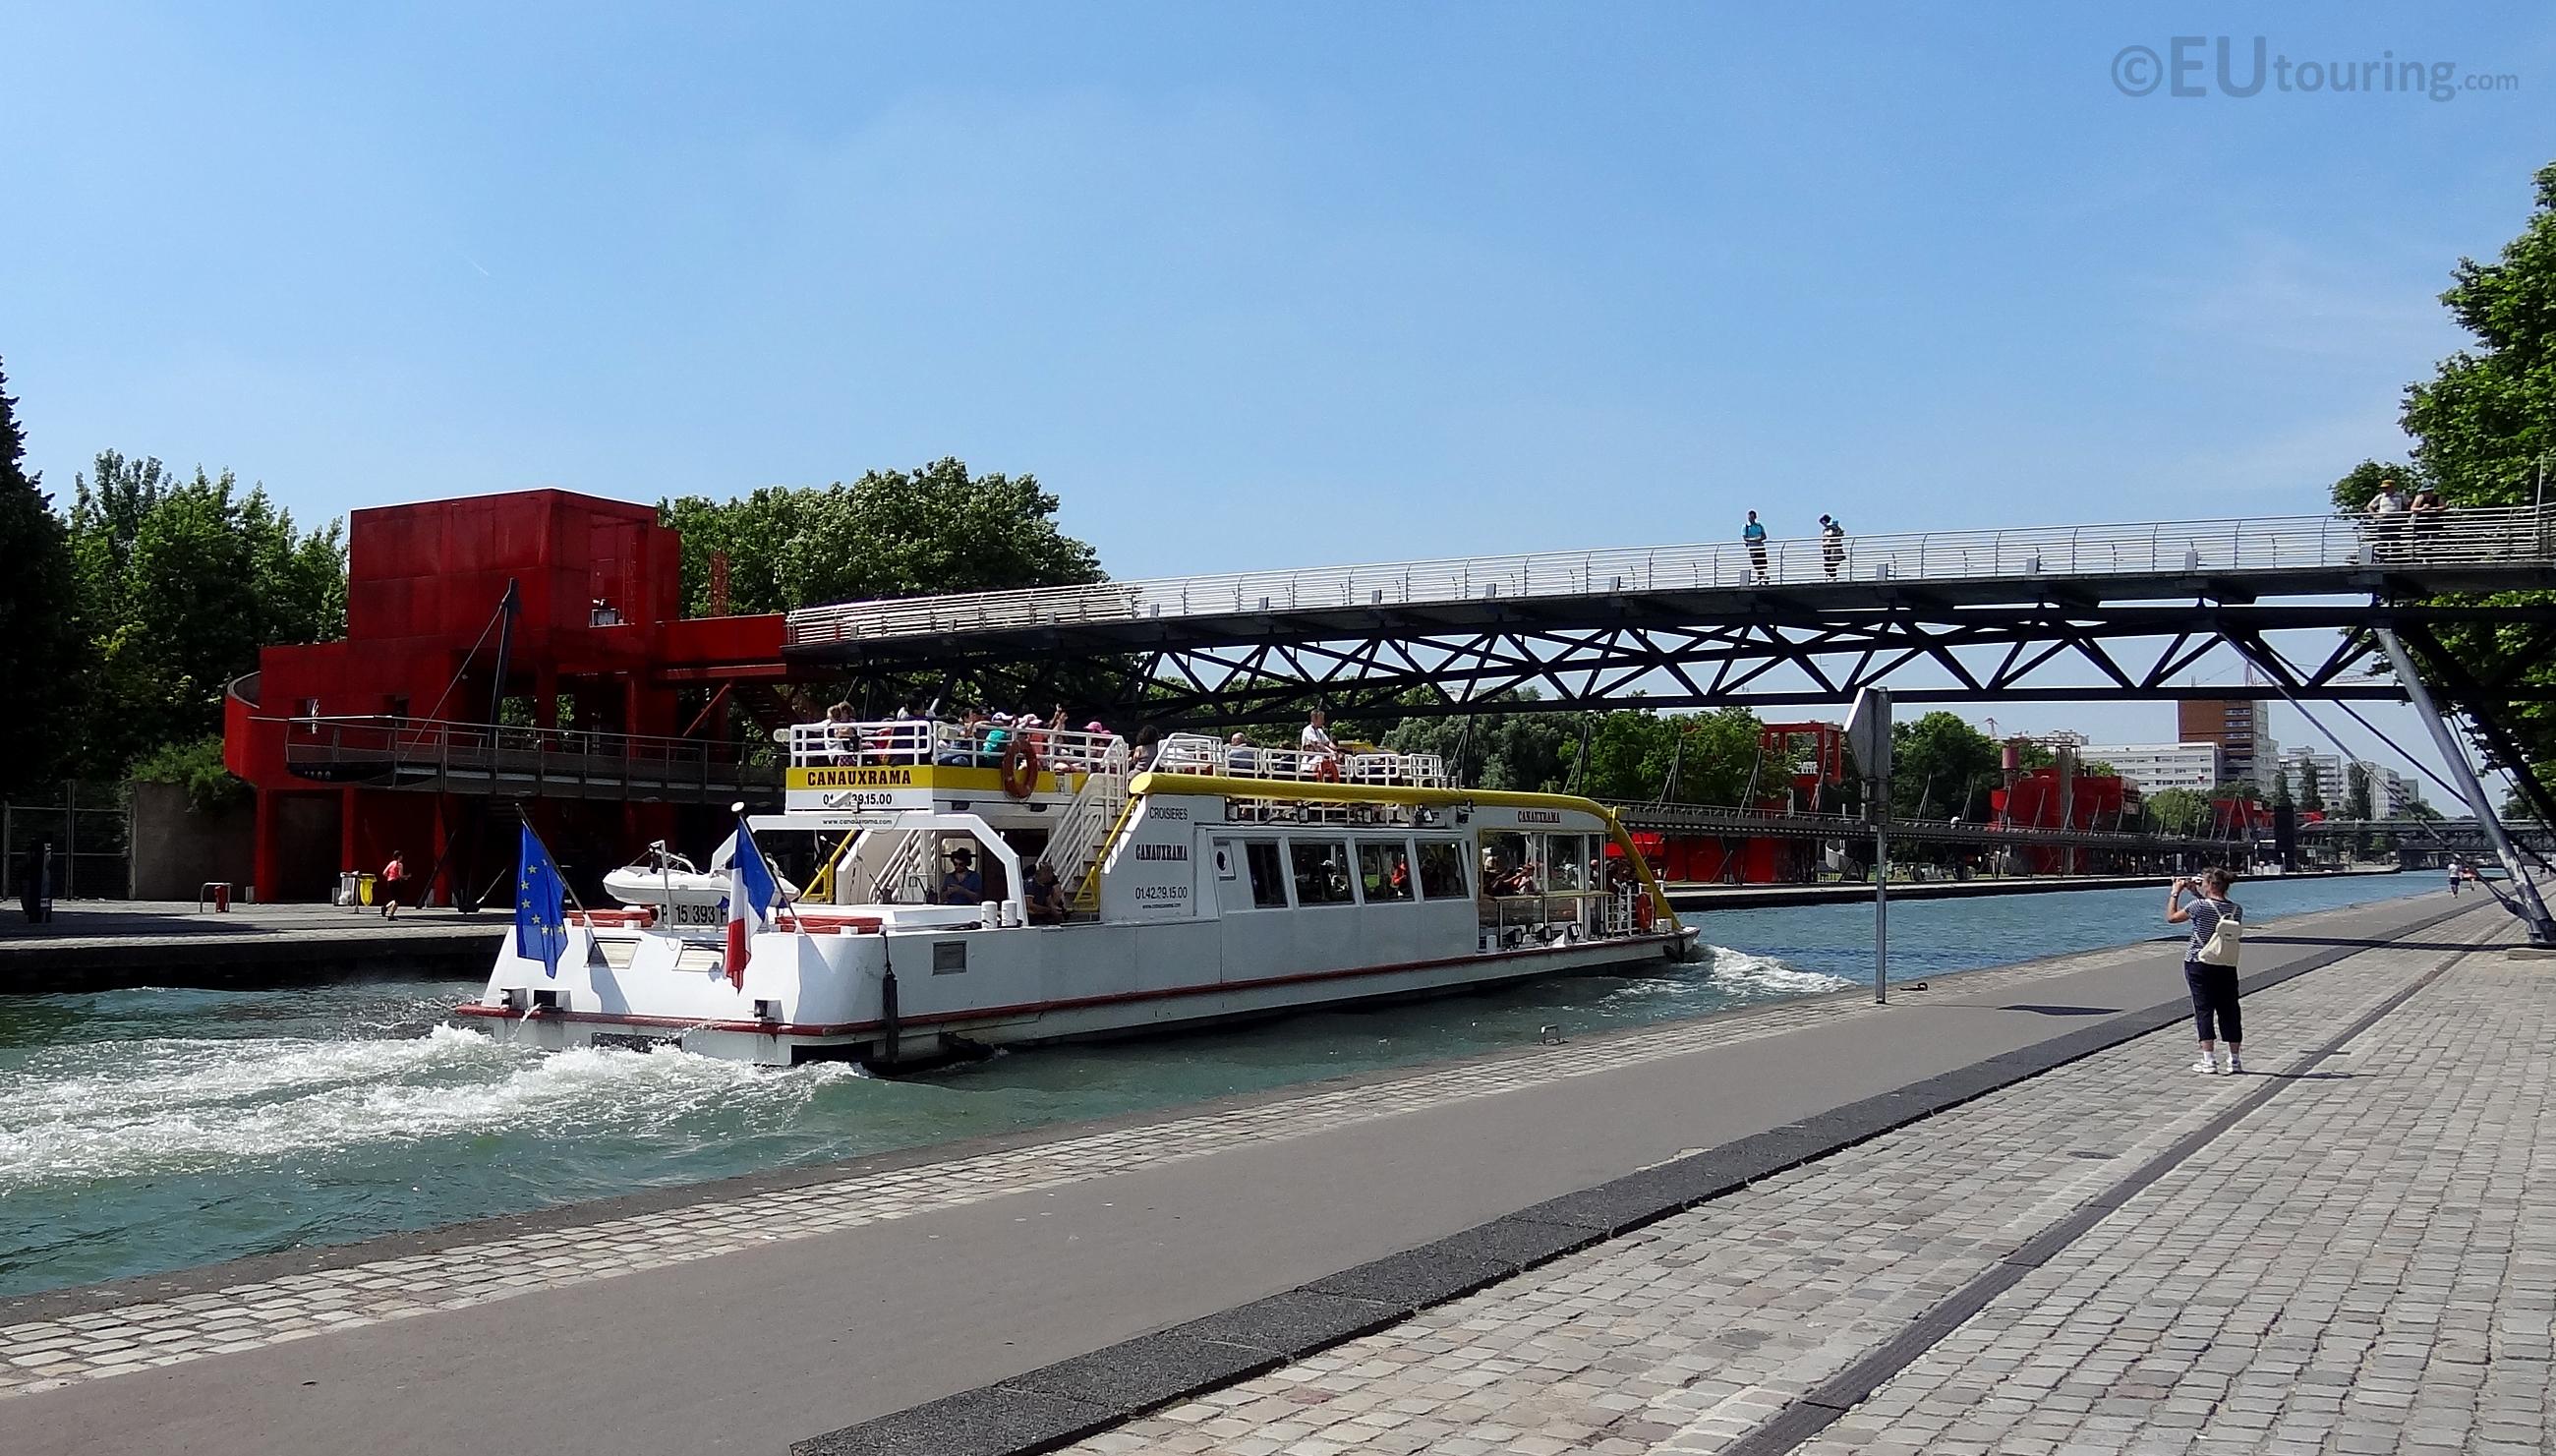 Cruise under a bridge